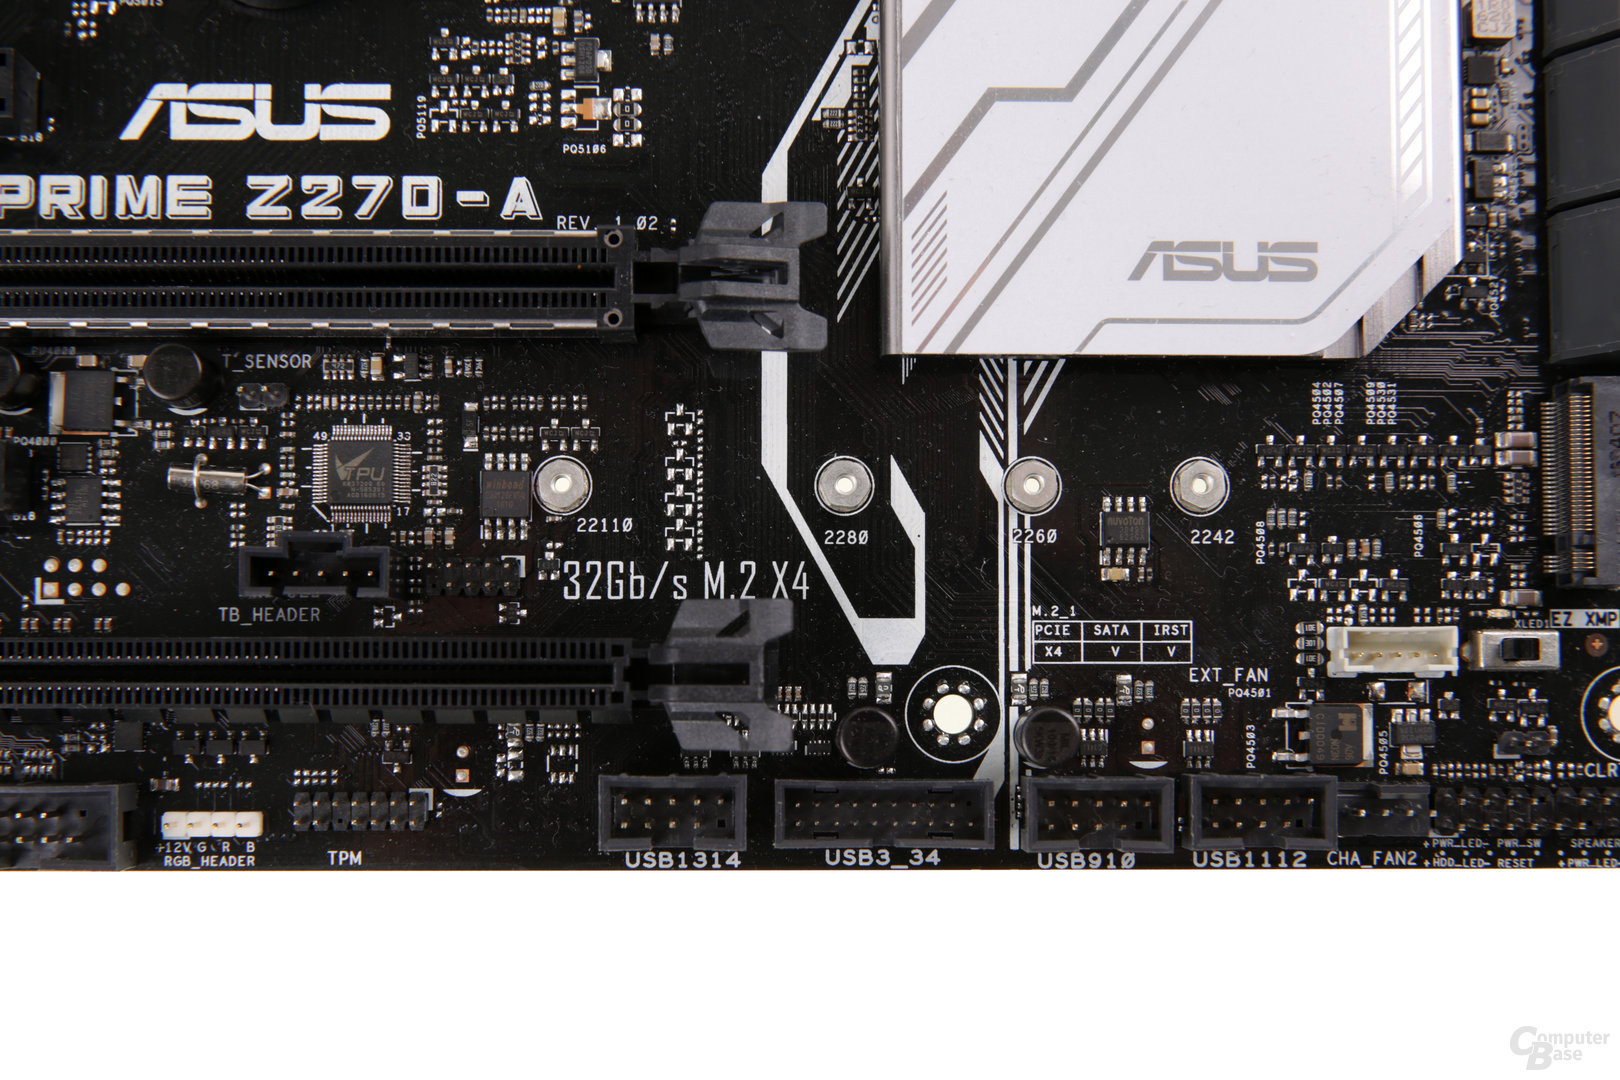 Z270-Platinen im Test: Asus Prime Z270-A